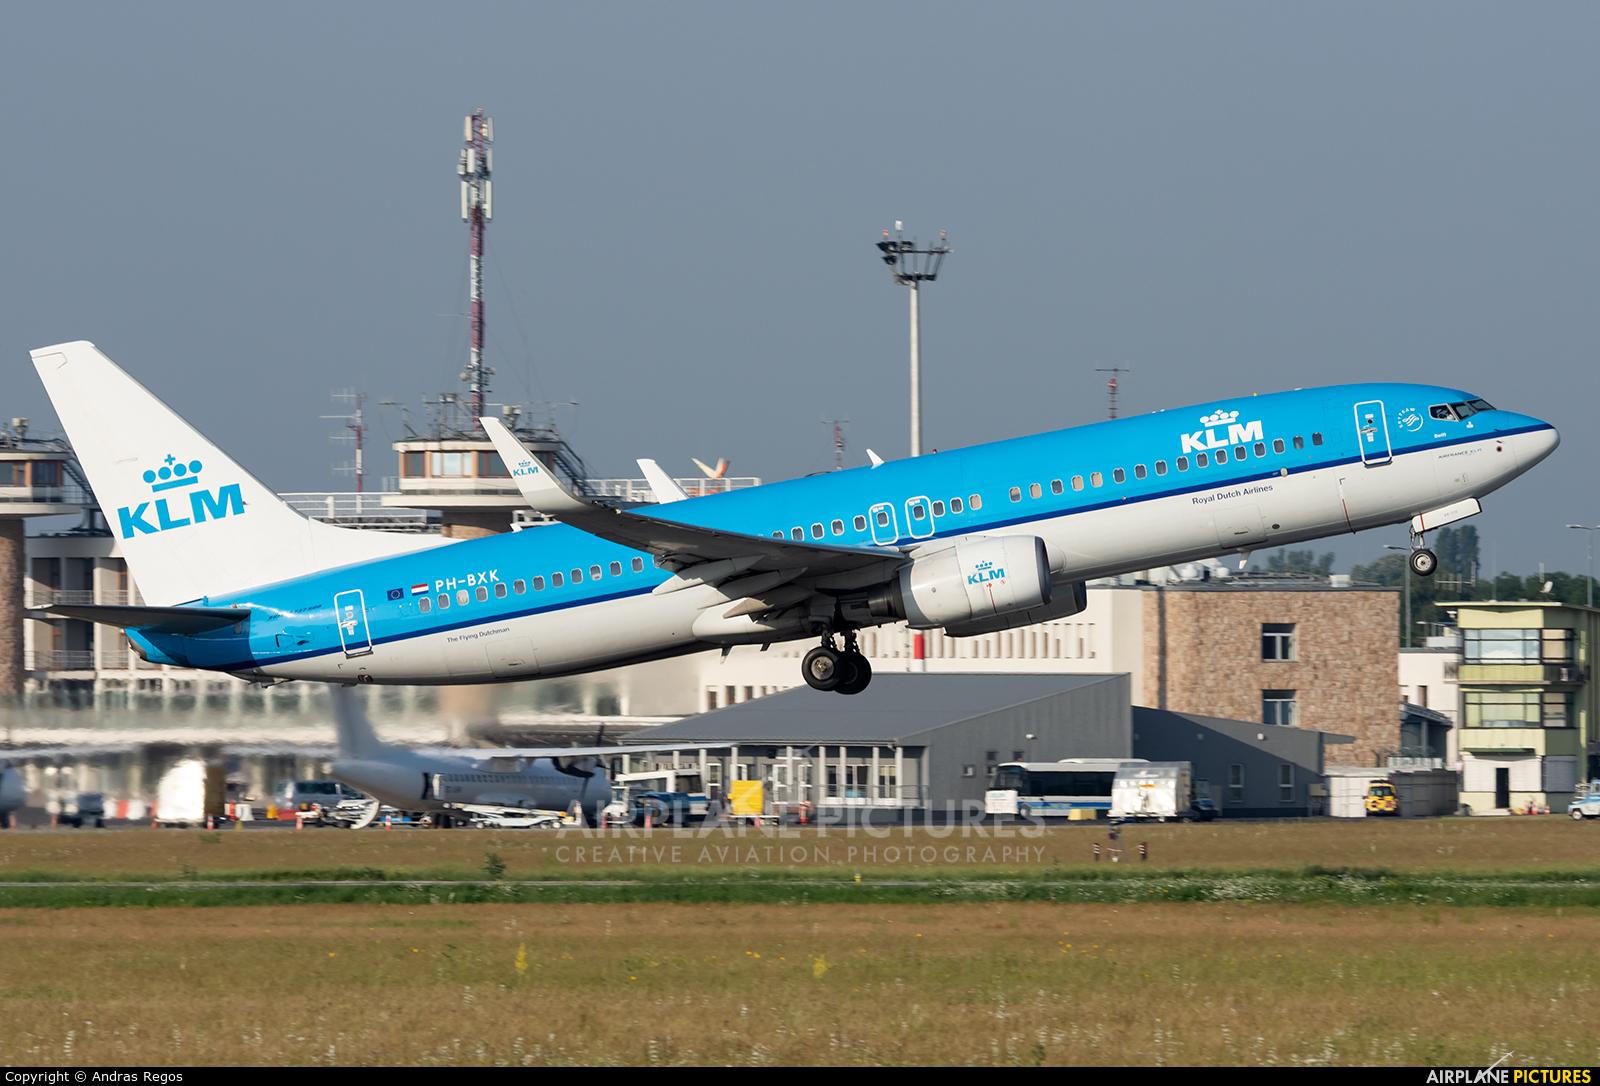 KLM PH-BXK aircraft at Budapest Ferenc Liszt International Airport